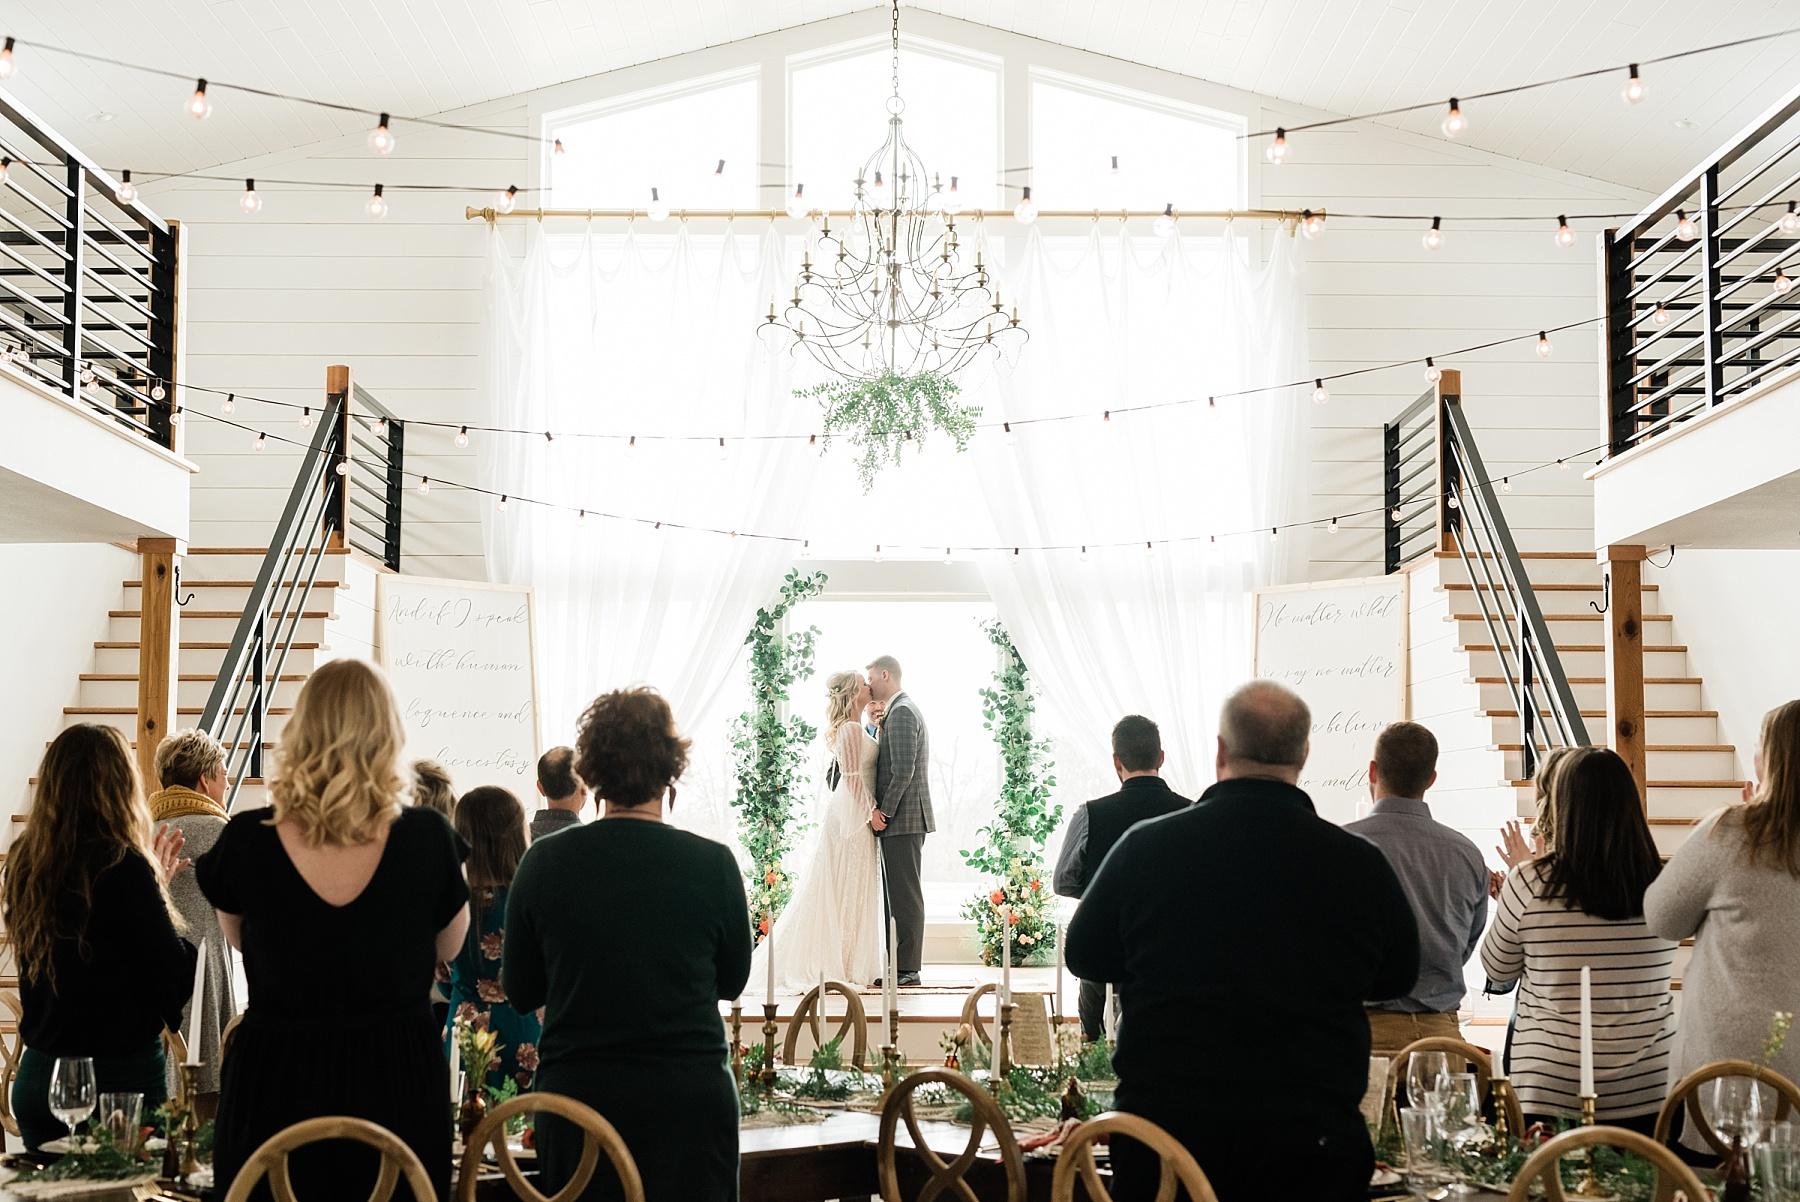 Eclectic Scandinavian Winter Wedding in All White Venue Emerson Fields by Kelsi Kliethermes Photography Best Missouri and Maui Wedding Photographer_0035.jpg